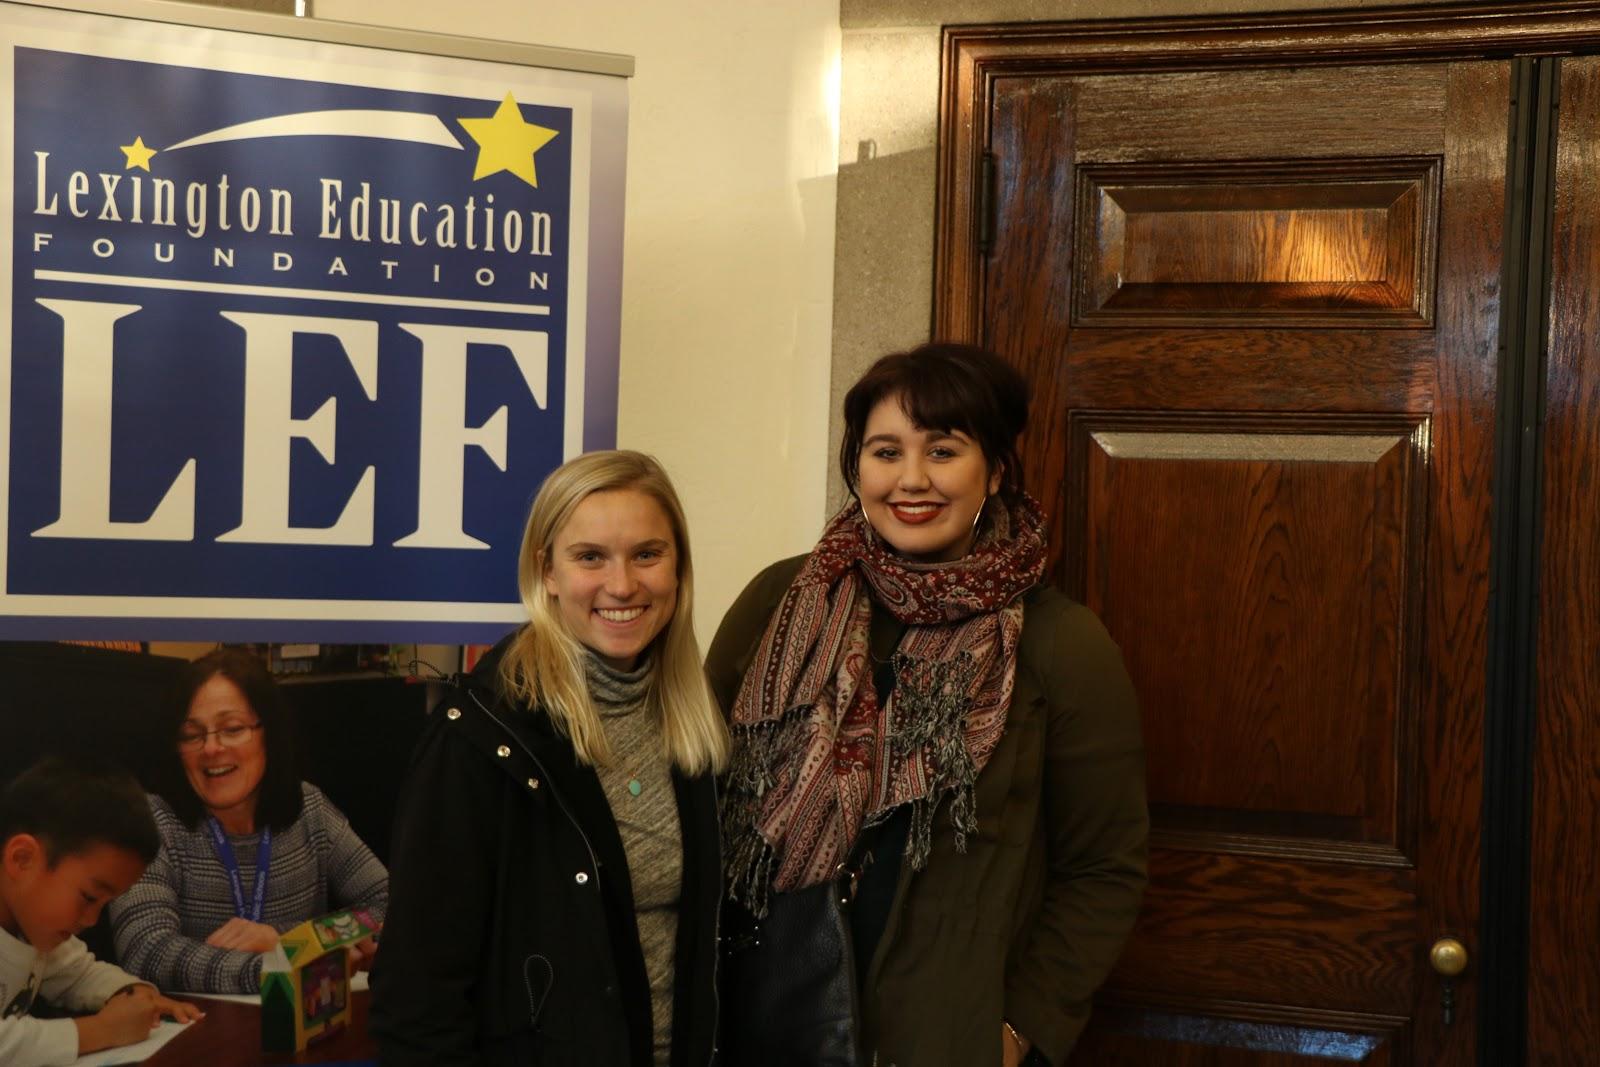 Photo of Taylor Liljegren and Samantha St. Lawrence courtesy of LHS student Sophia Sullivan